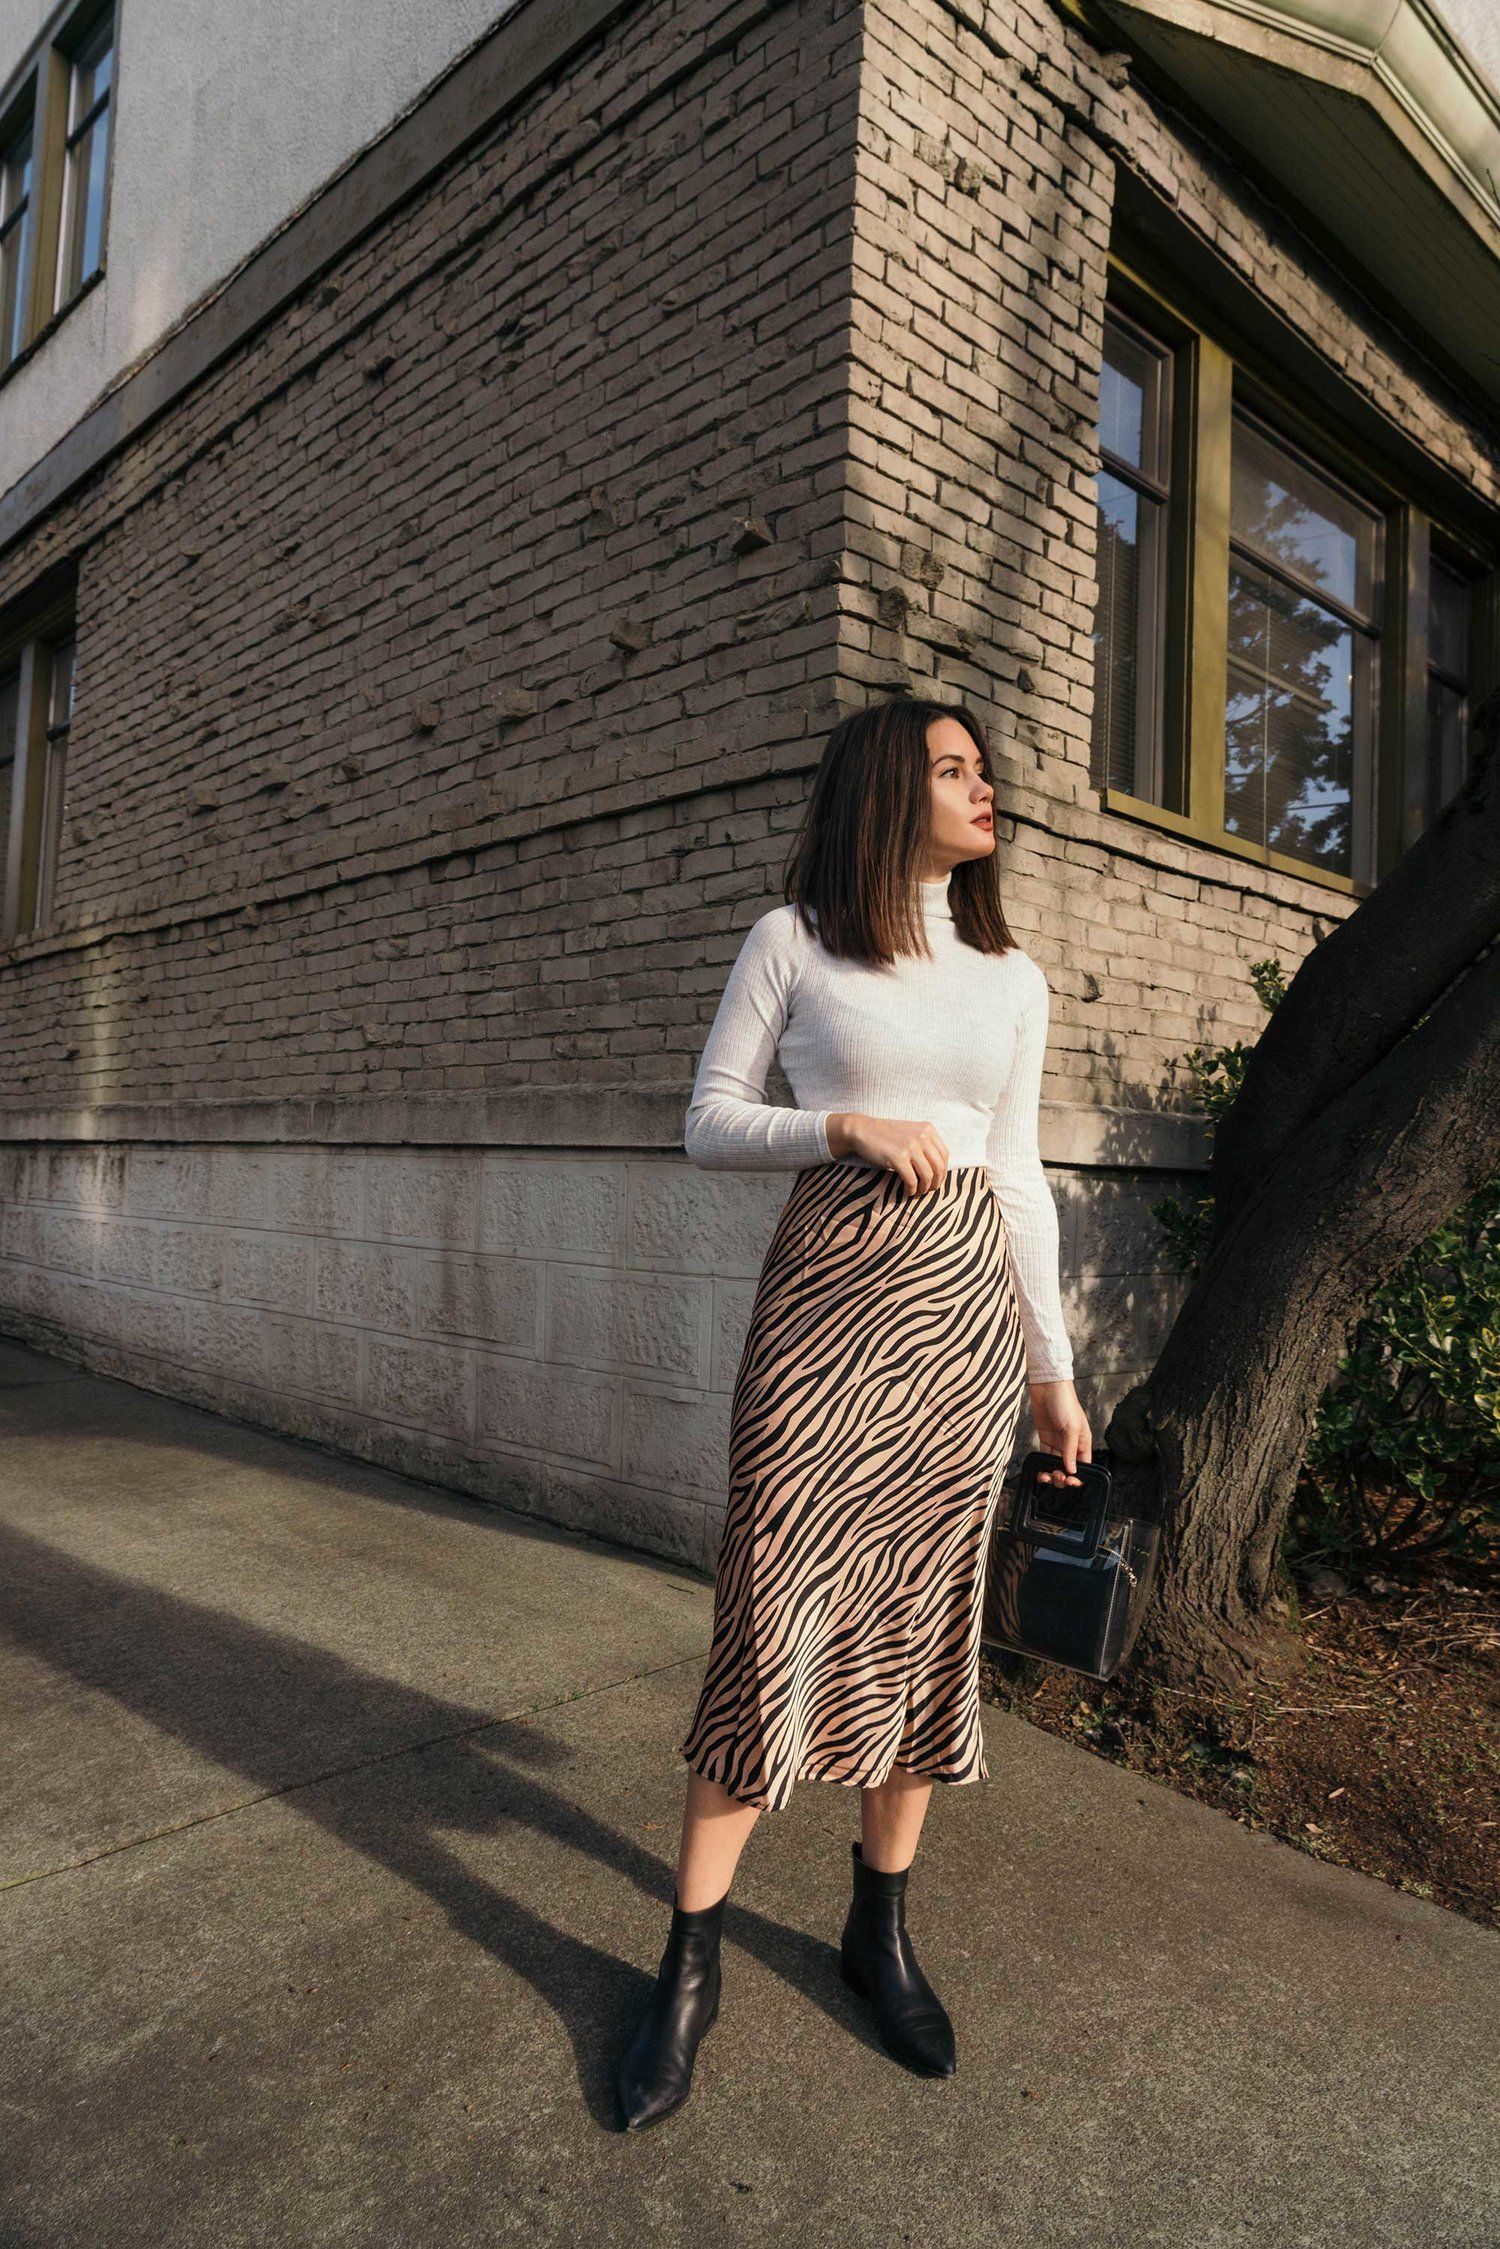 Ashleigh Kizer tiger print midi skirt | printed skirt outfit, seattle